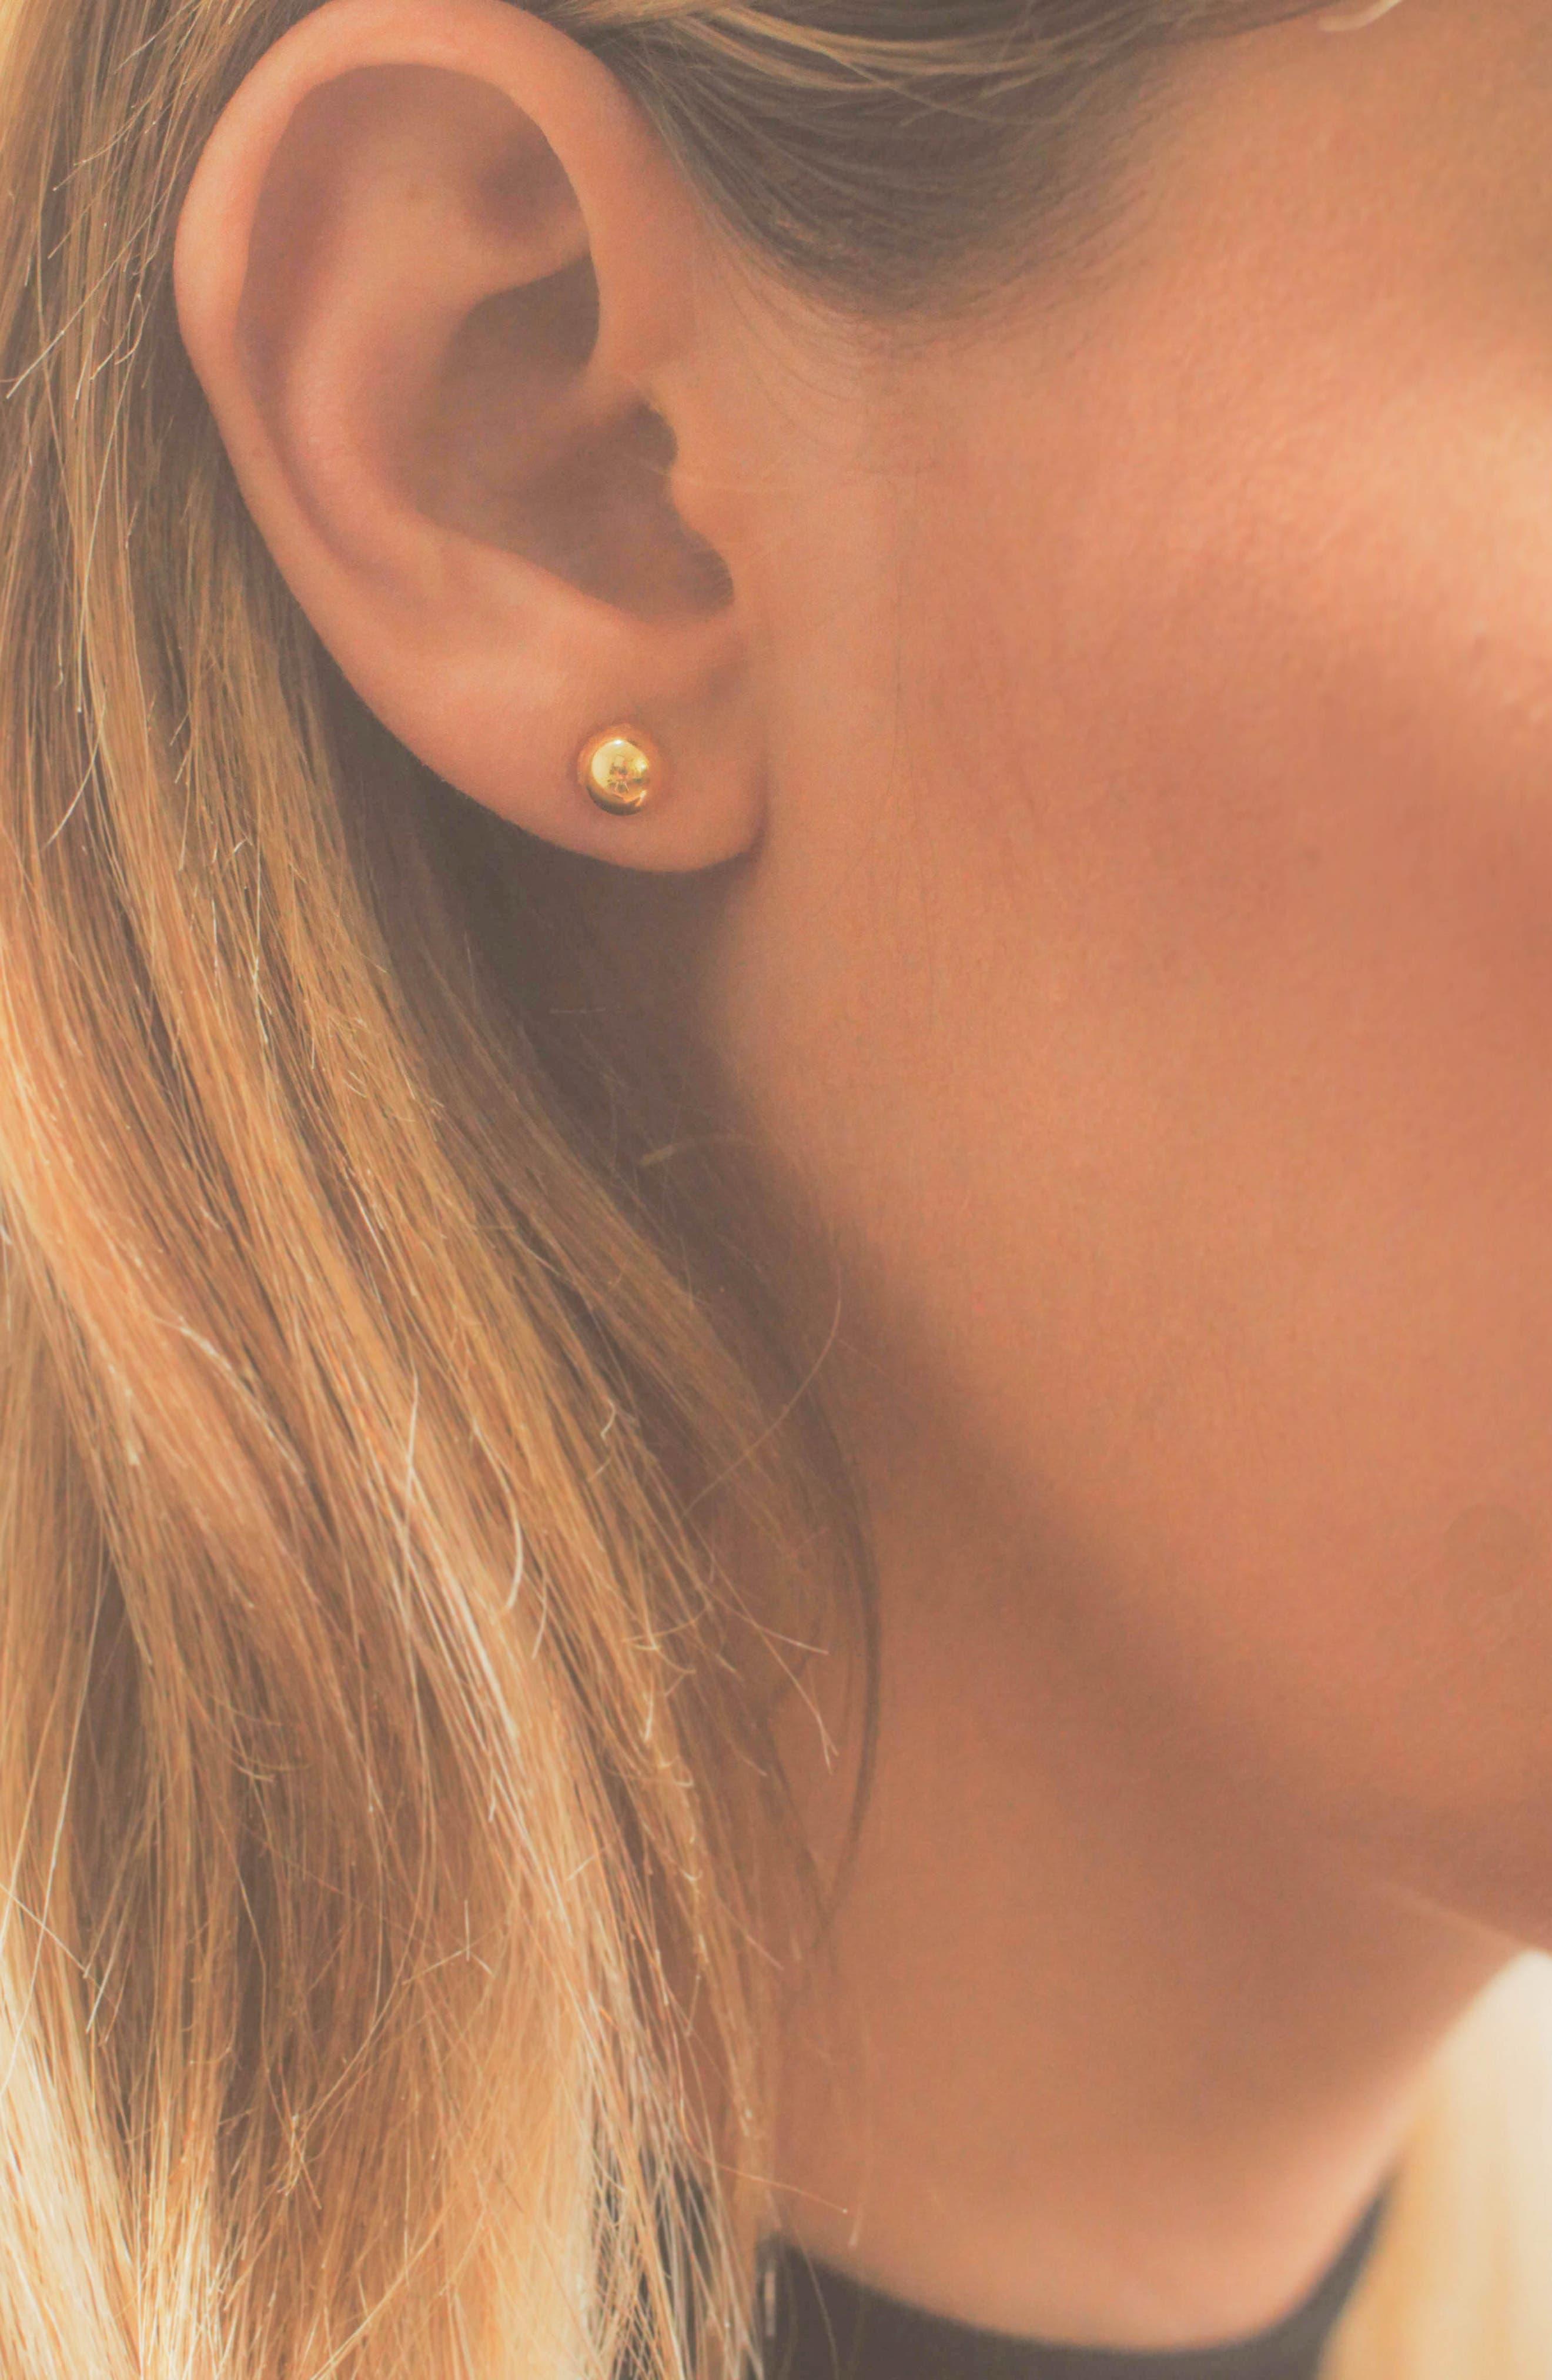 14K Ball Stud Earrings,                             Alternate thumbnail 3, color,                             YELLOW GOLD